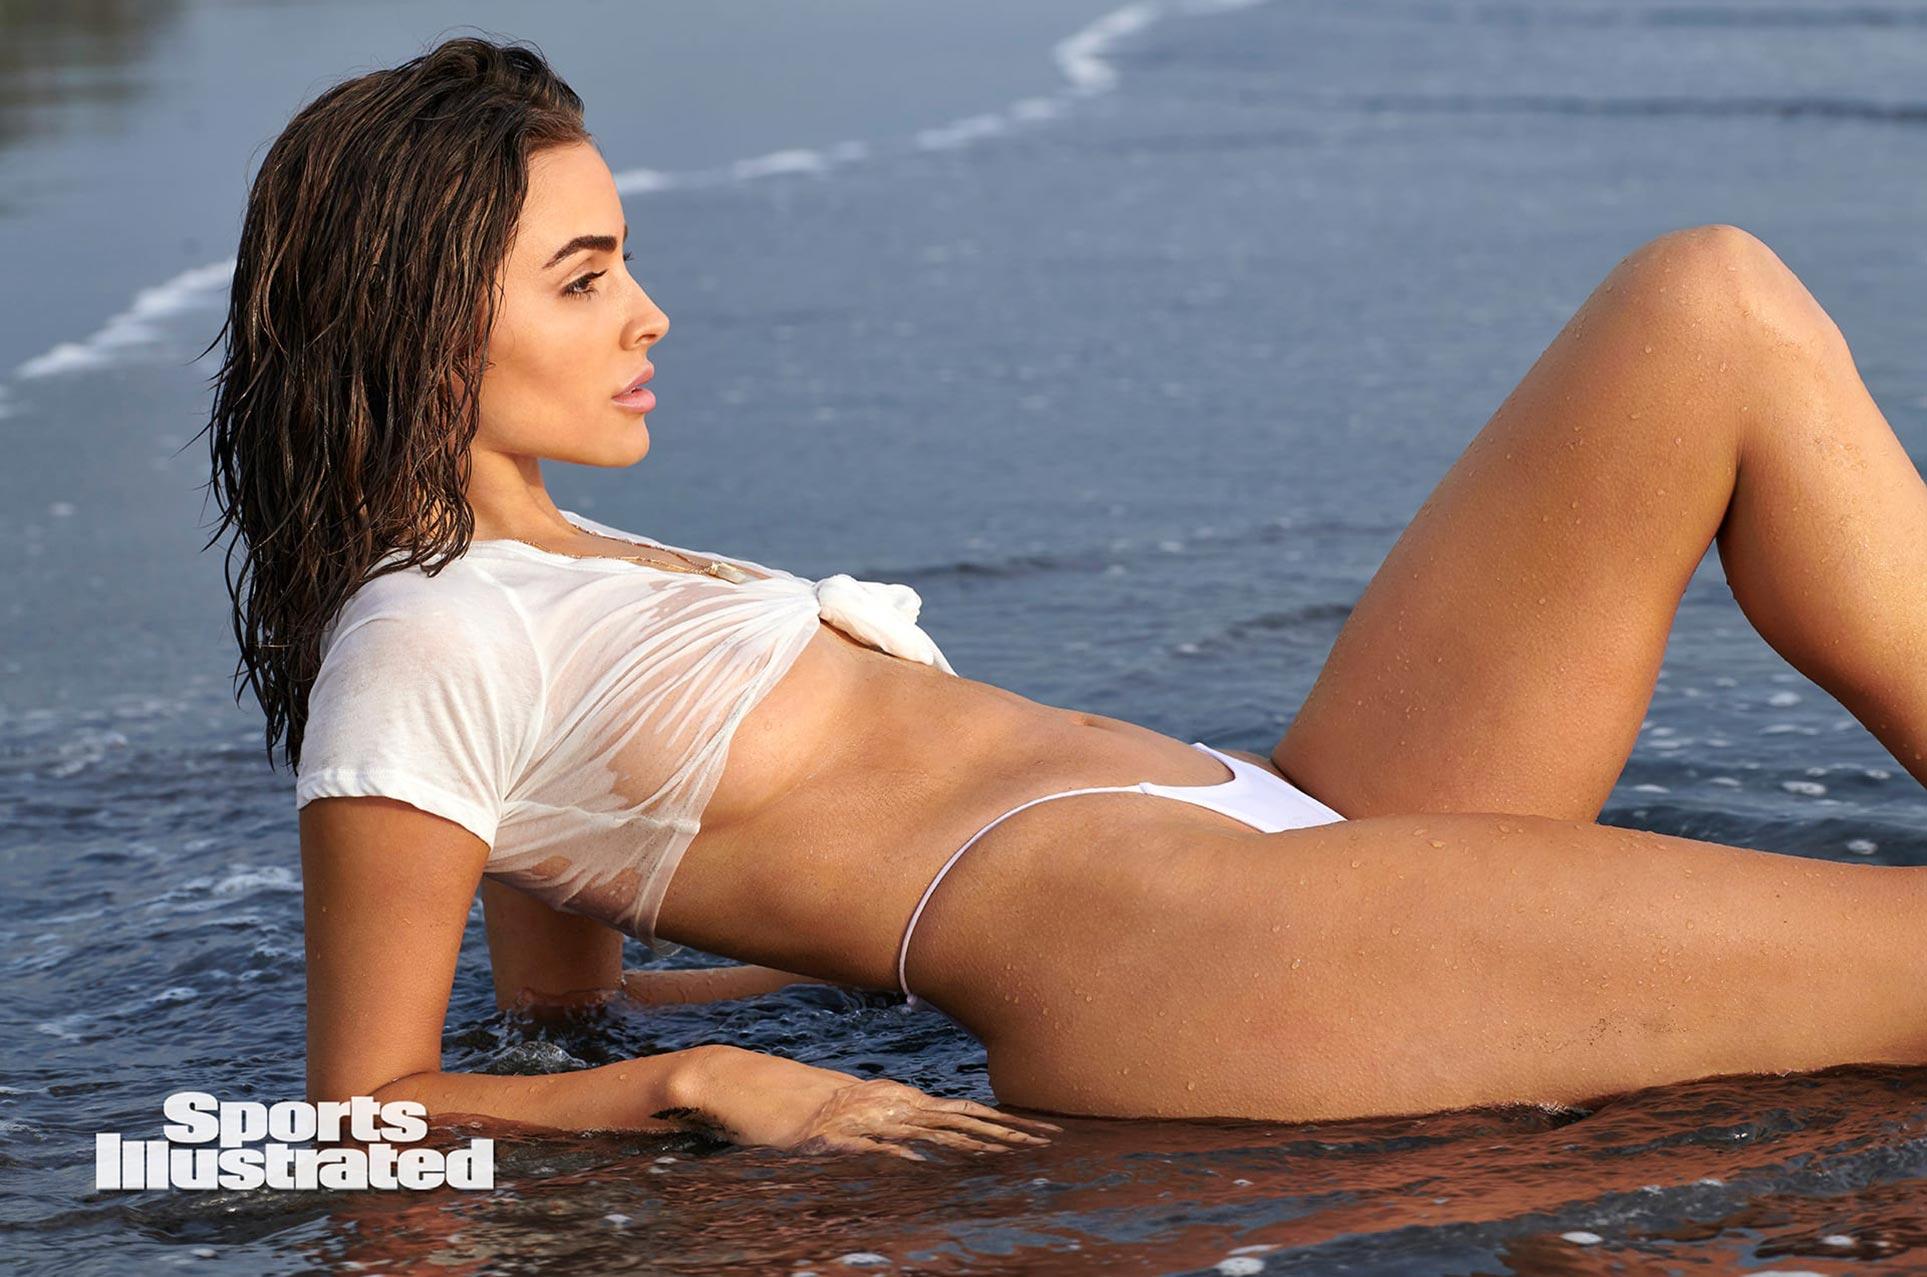 Оливия Калпо в каталоге купальников Sports Illustrated Swimsuit 2020 / фото 19